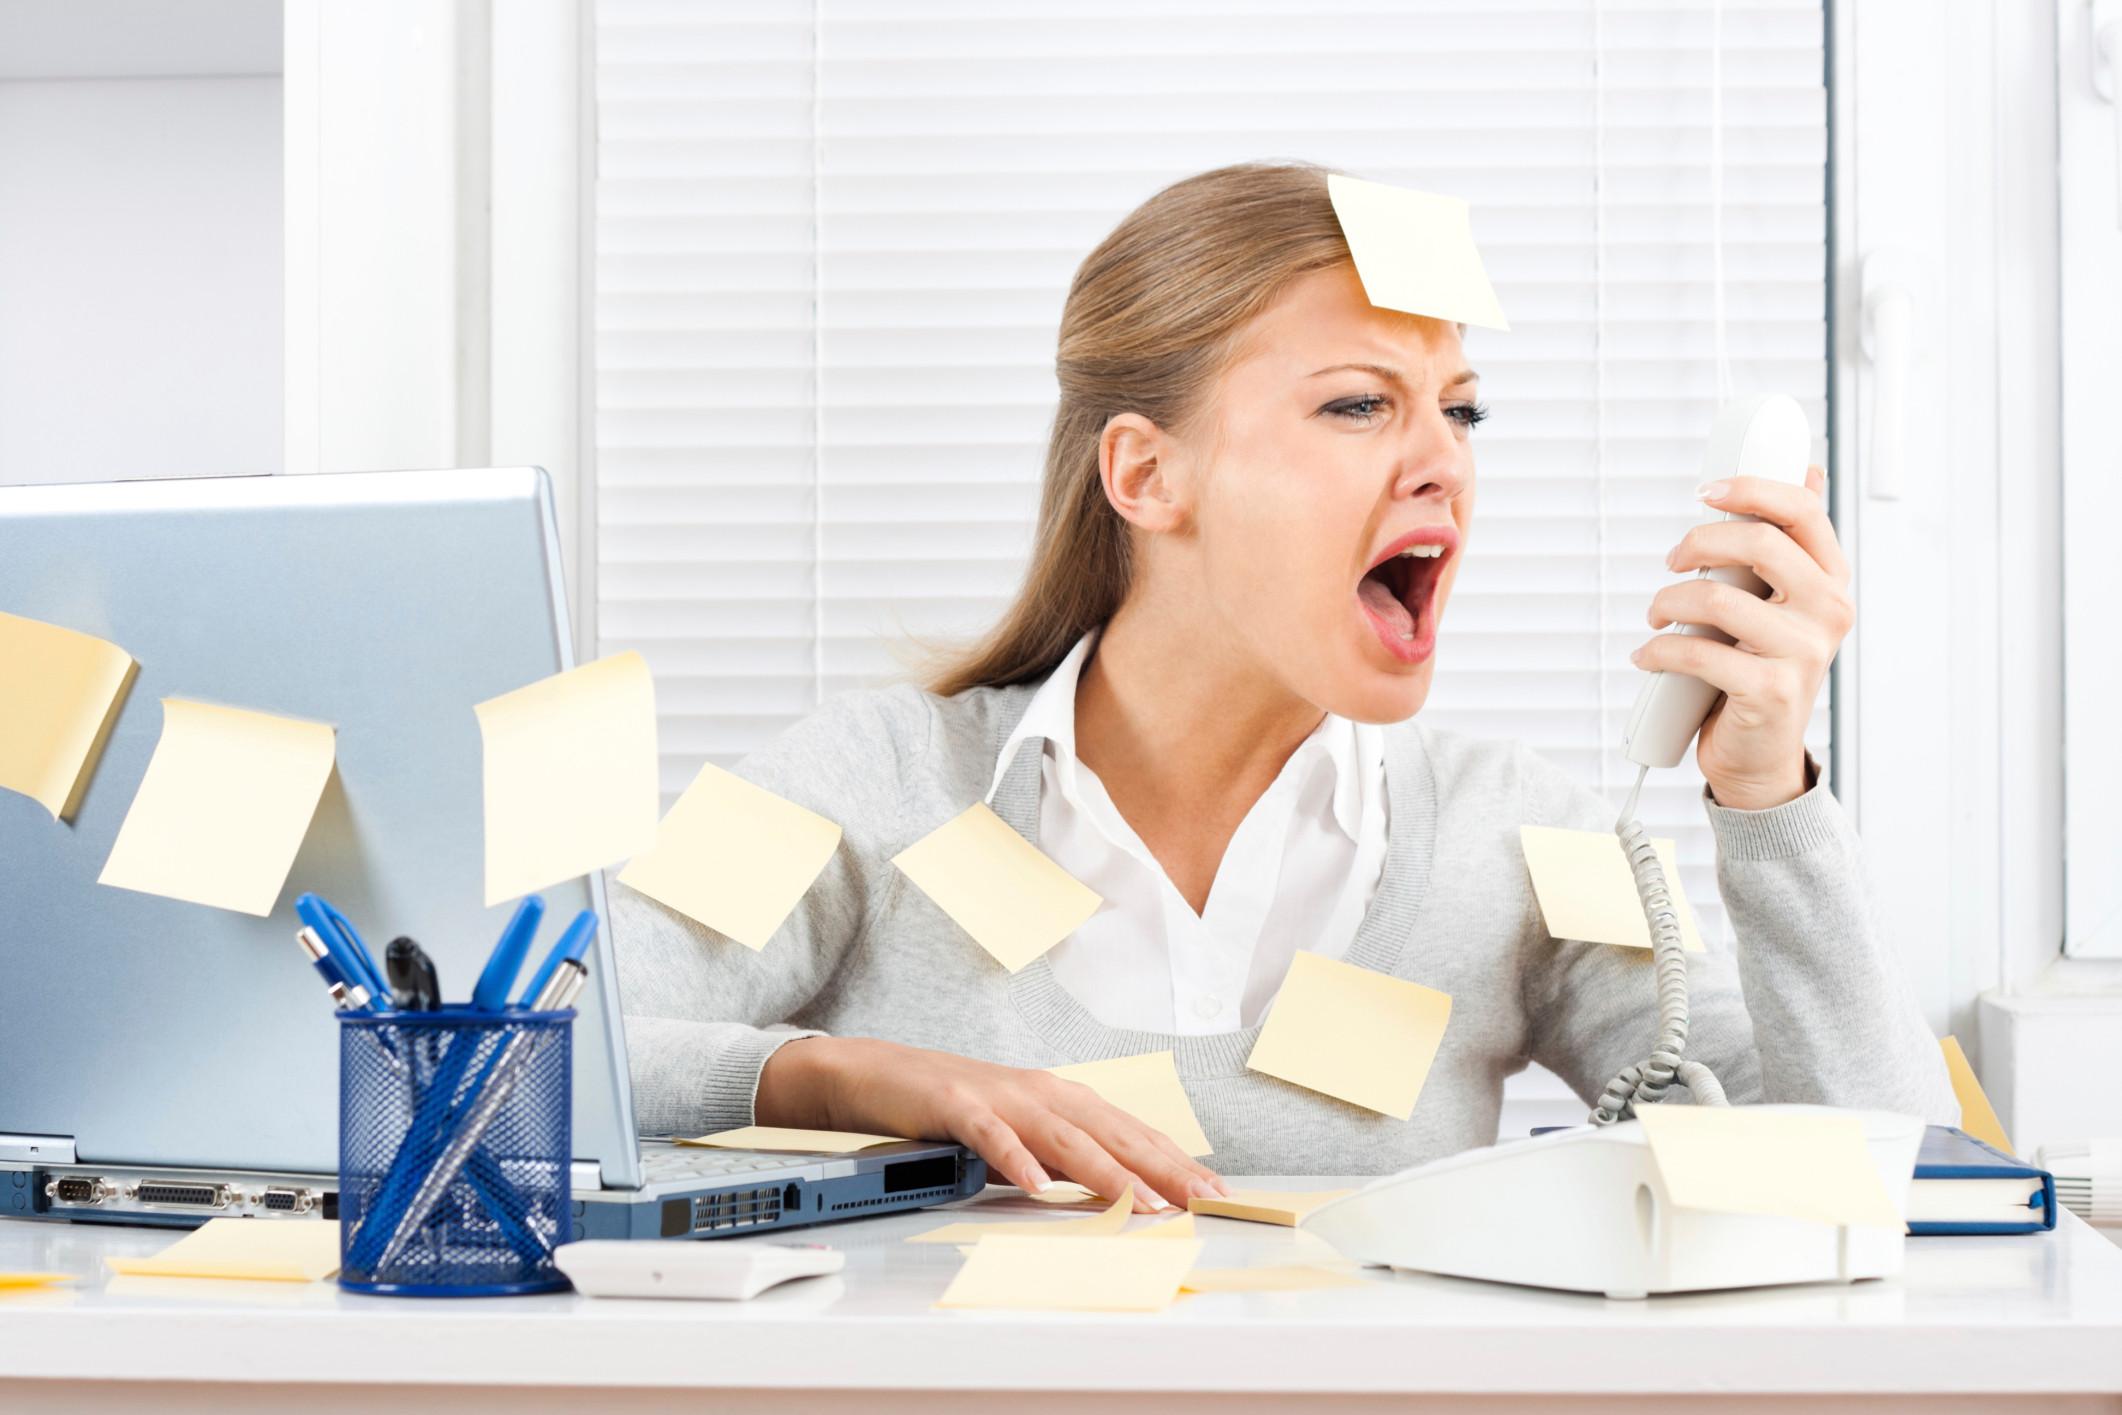 stress-angry-work.jpg